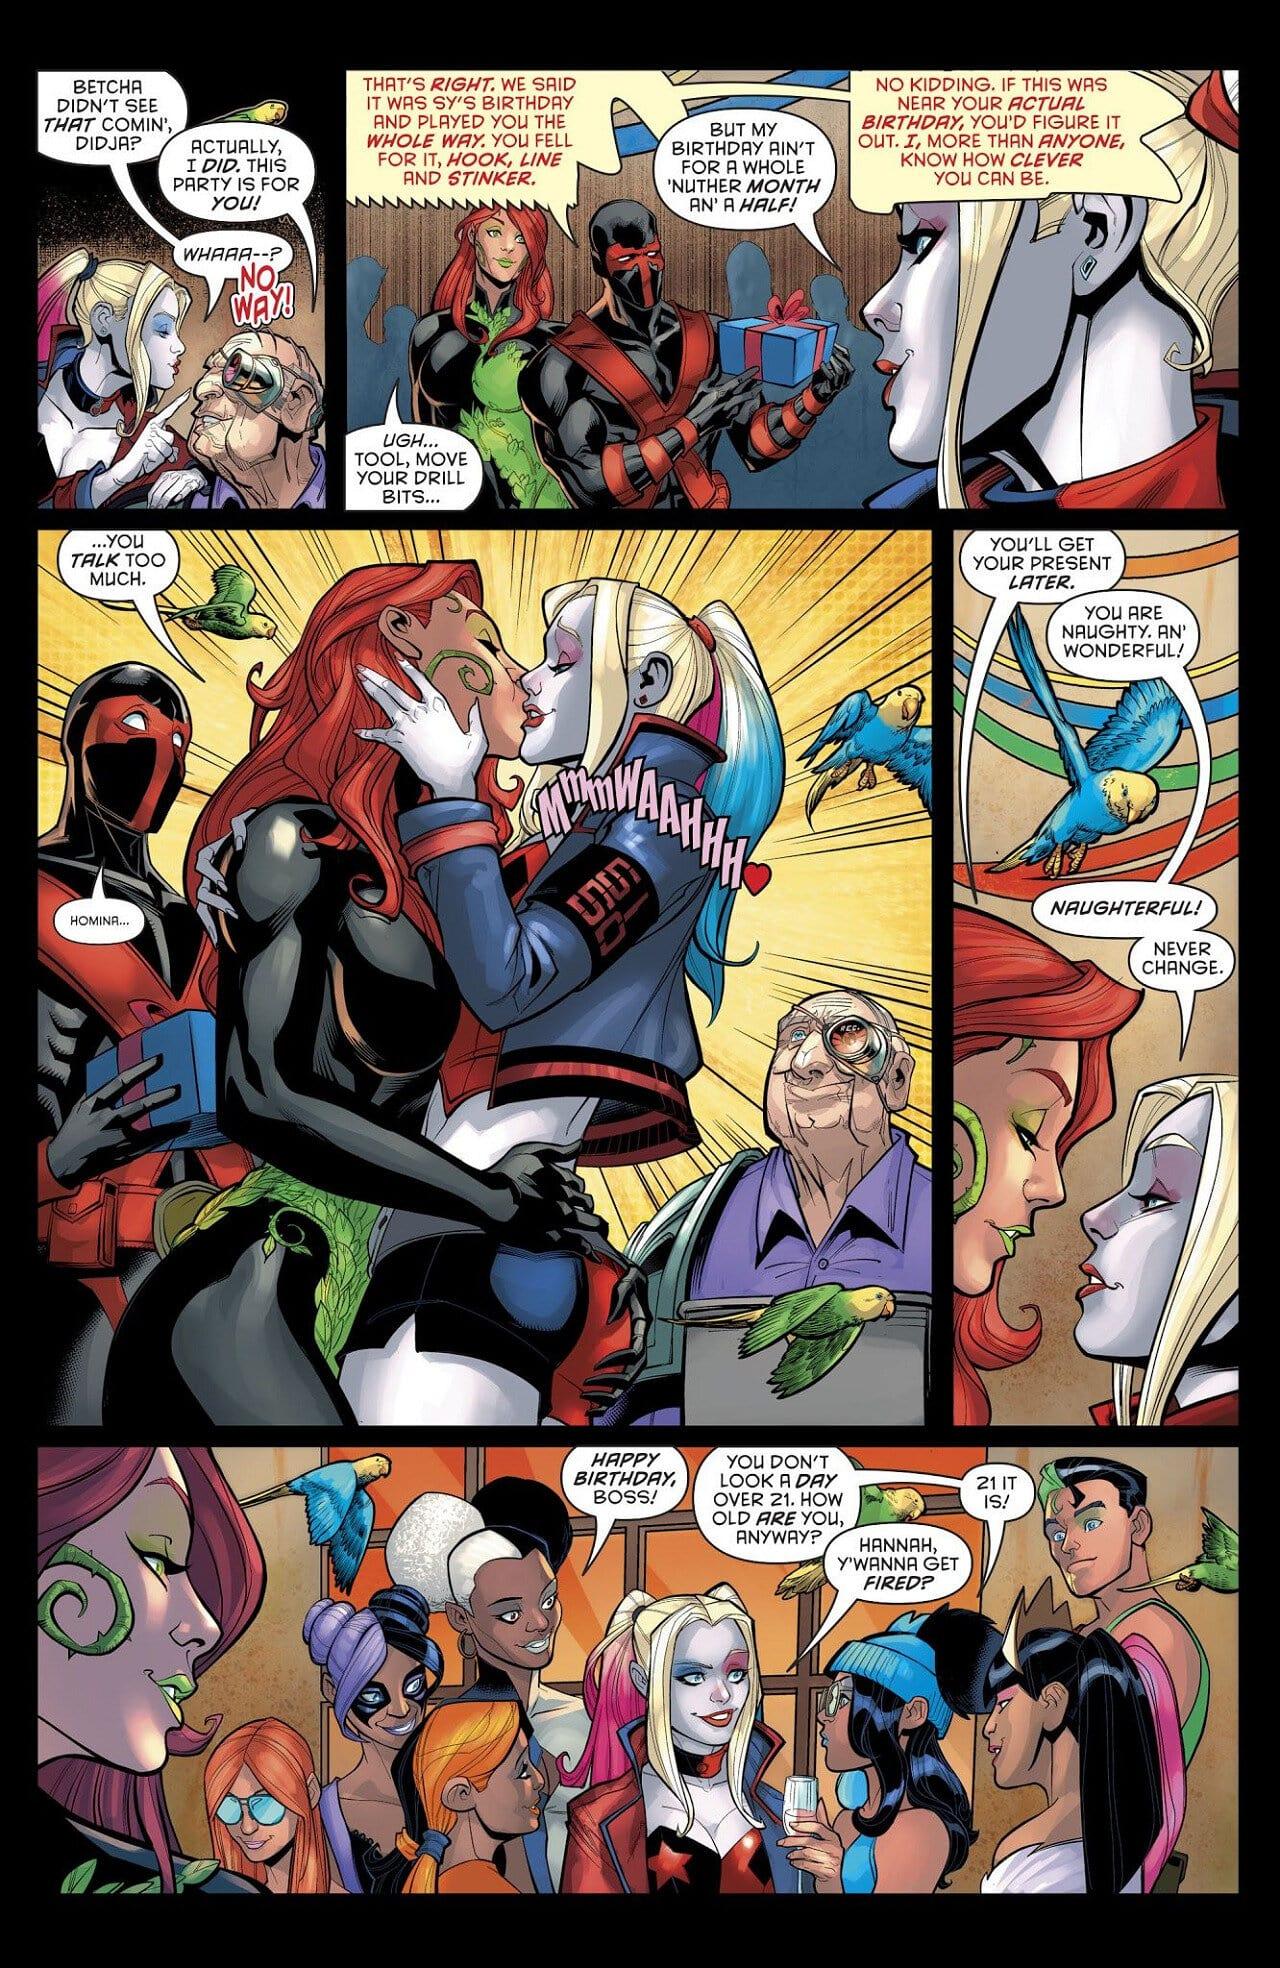 dc cómics harley quinn poison ivy beso cómic